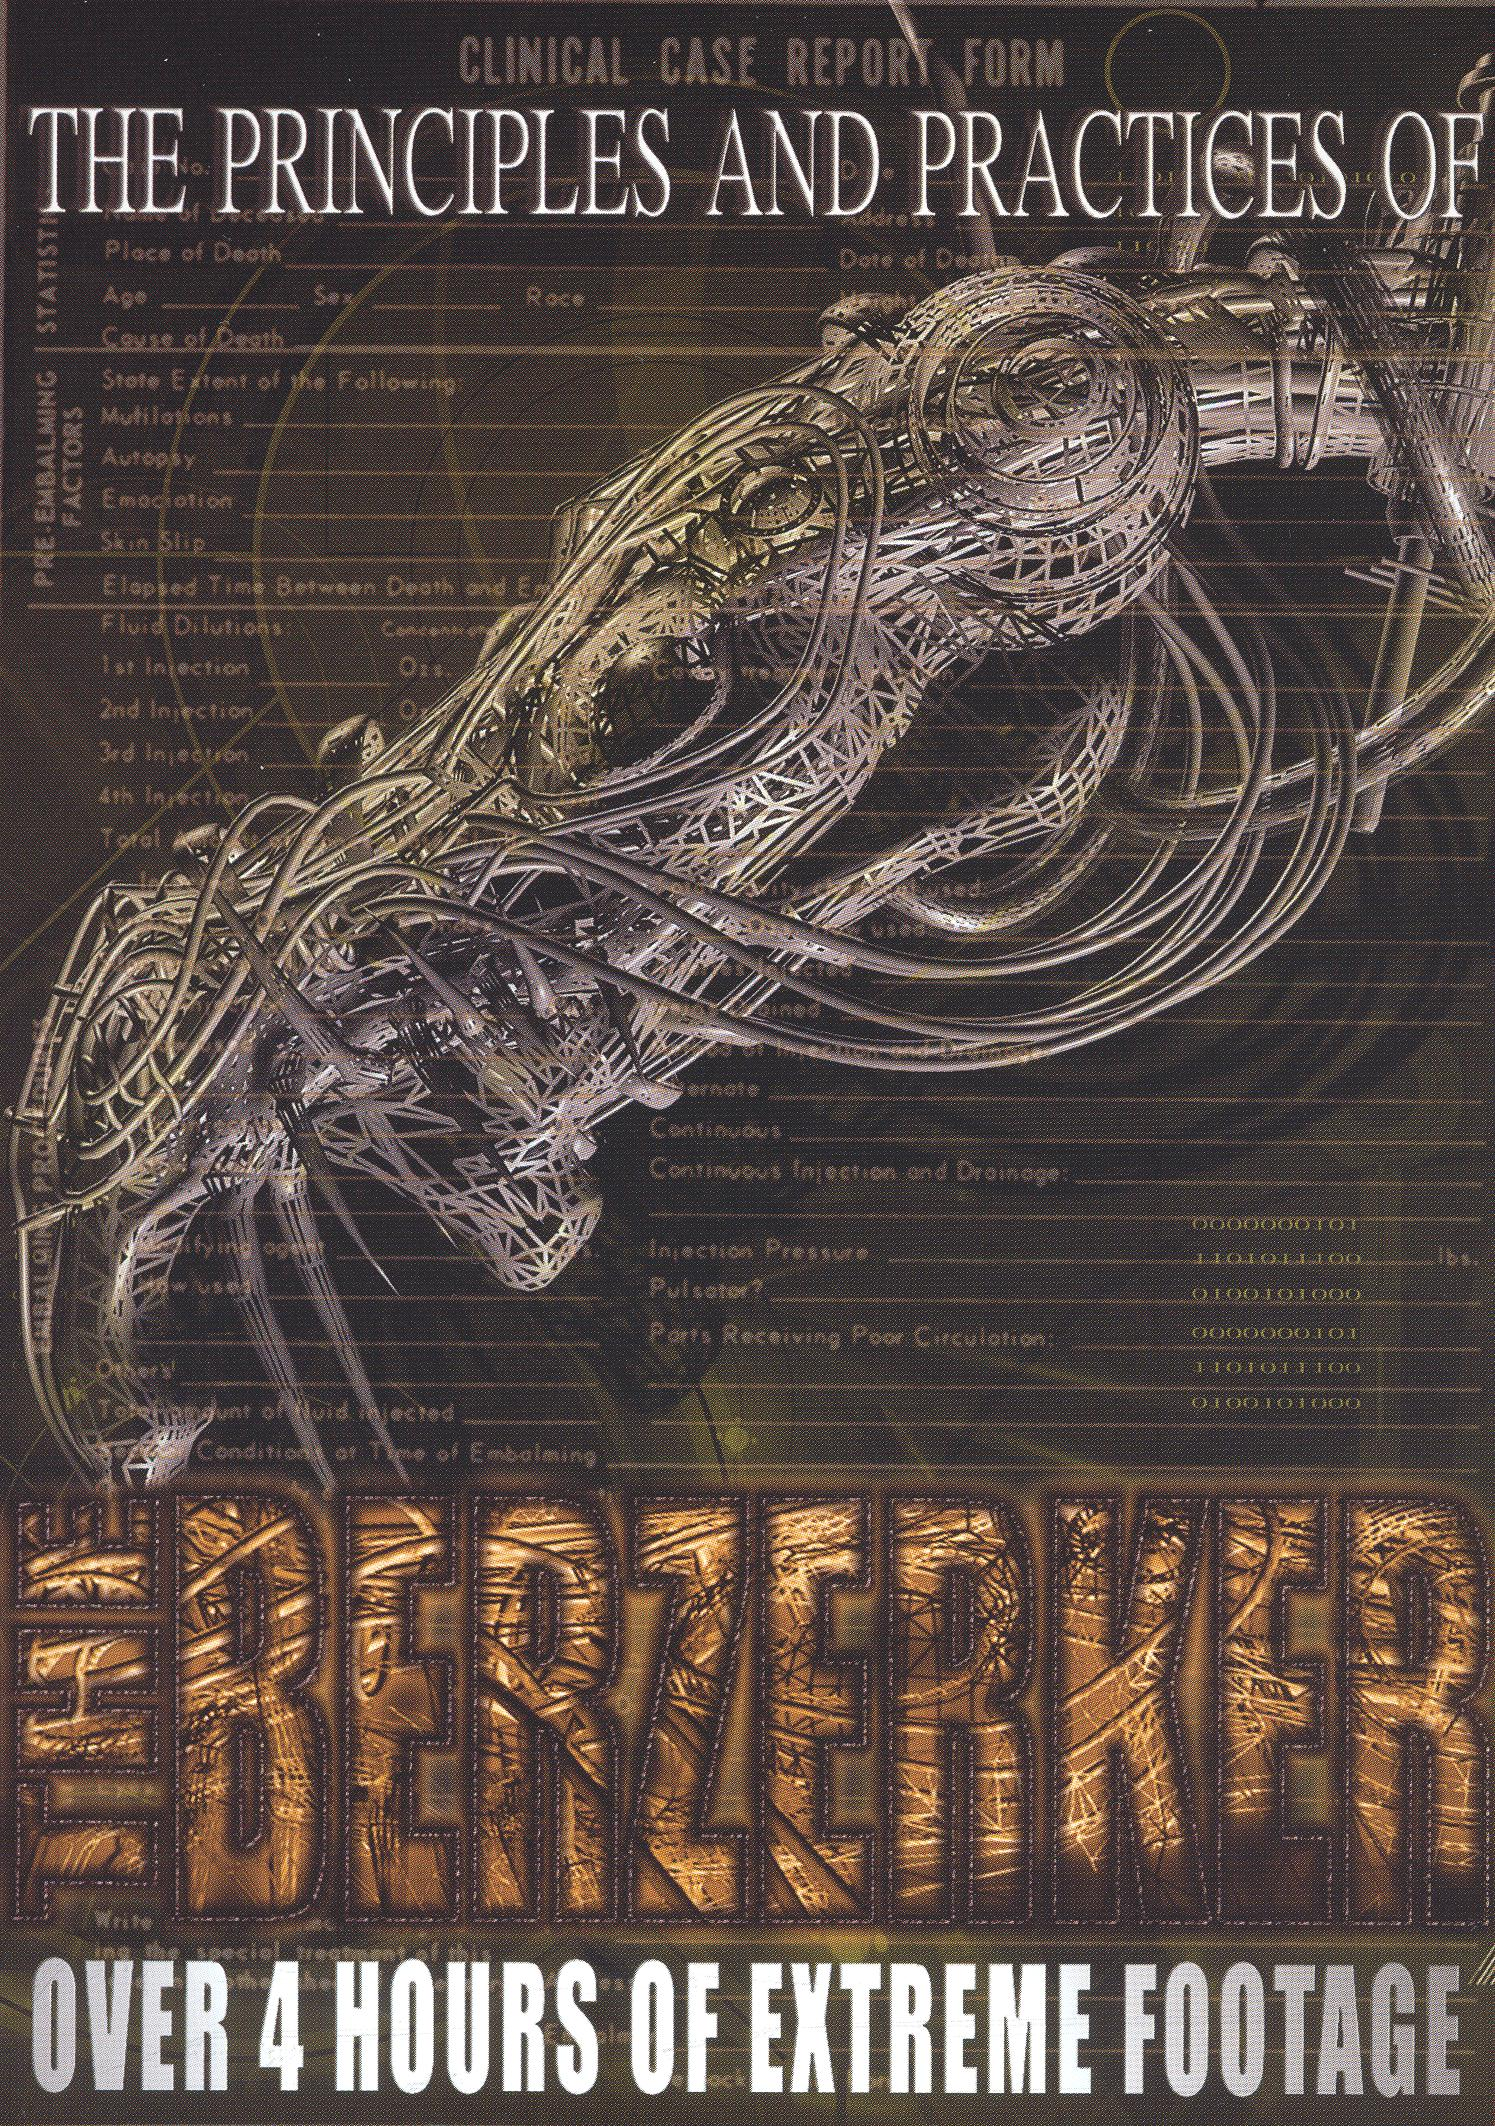 The Berzerker: The Principles and Practices of the Berzerker